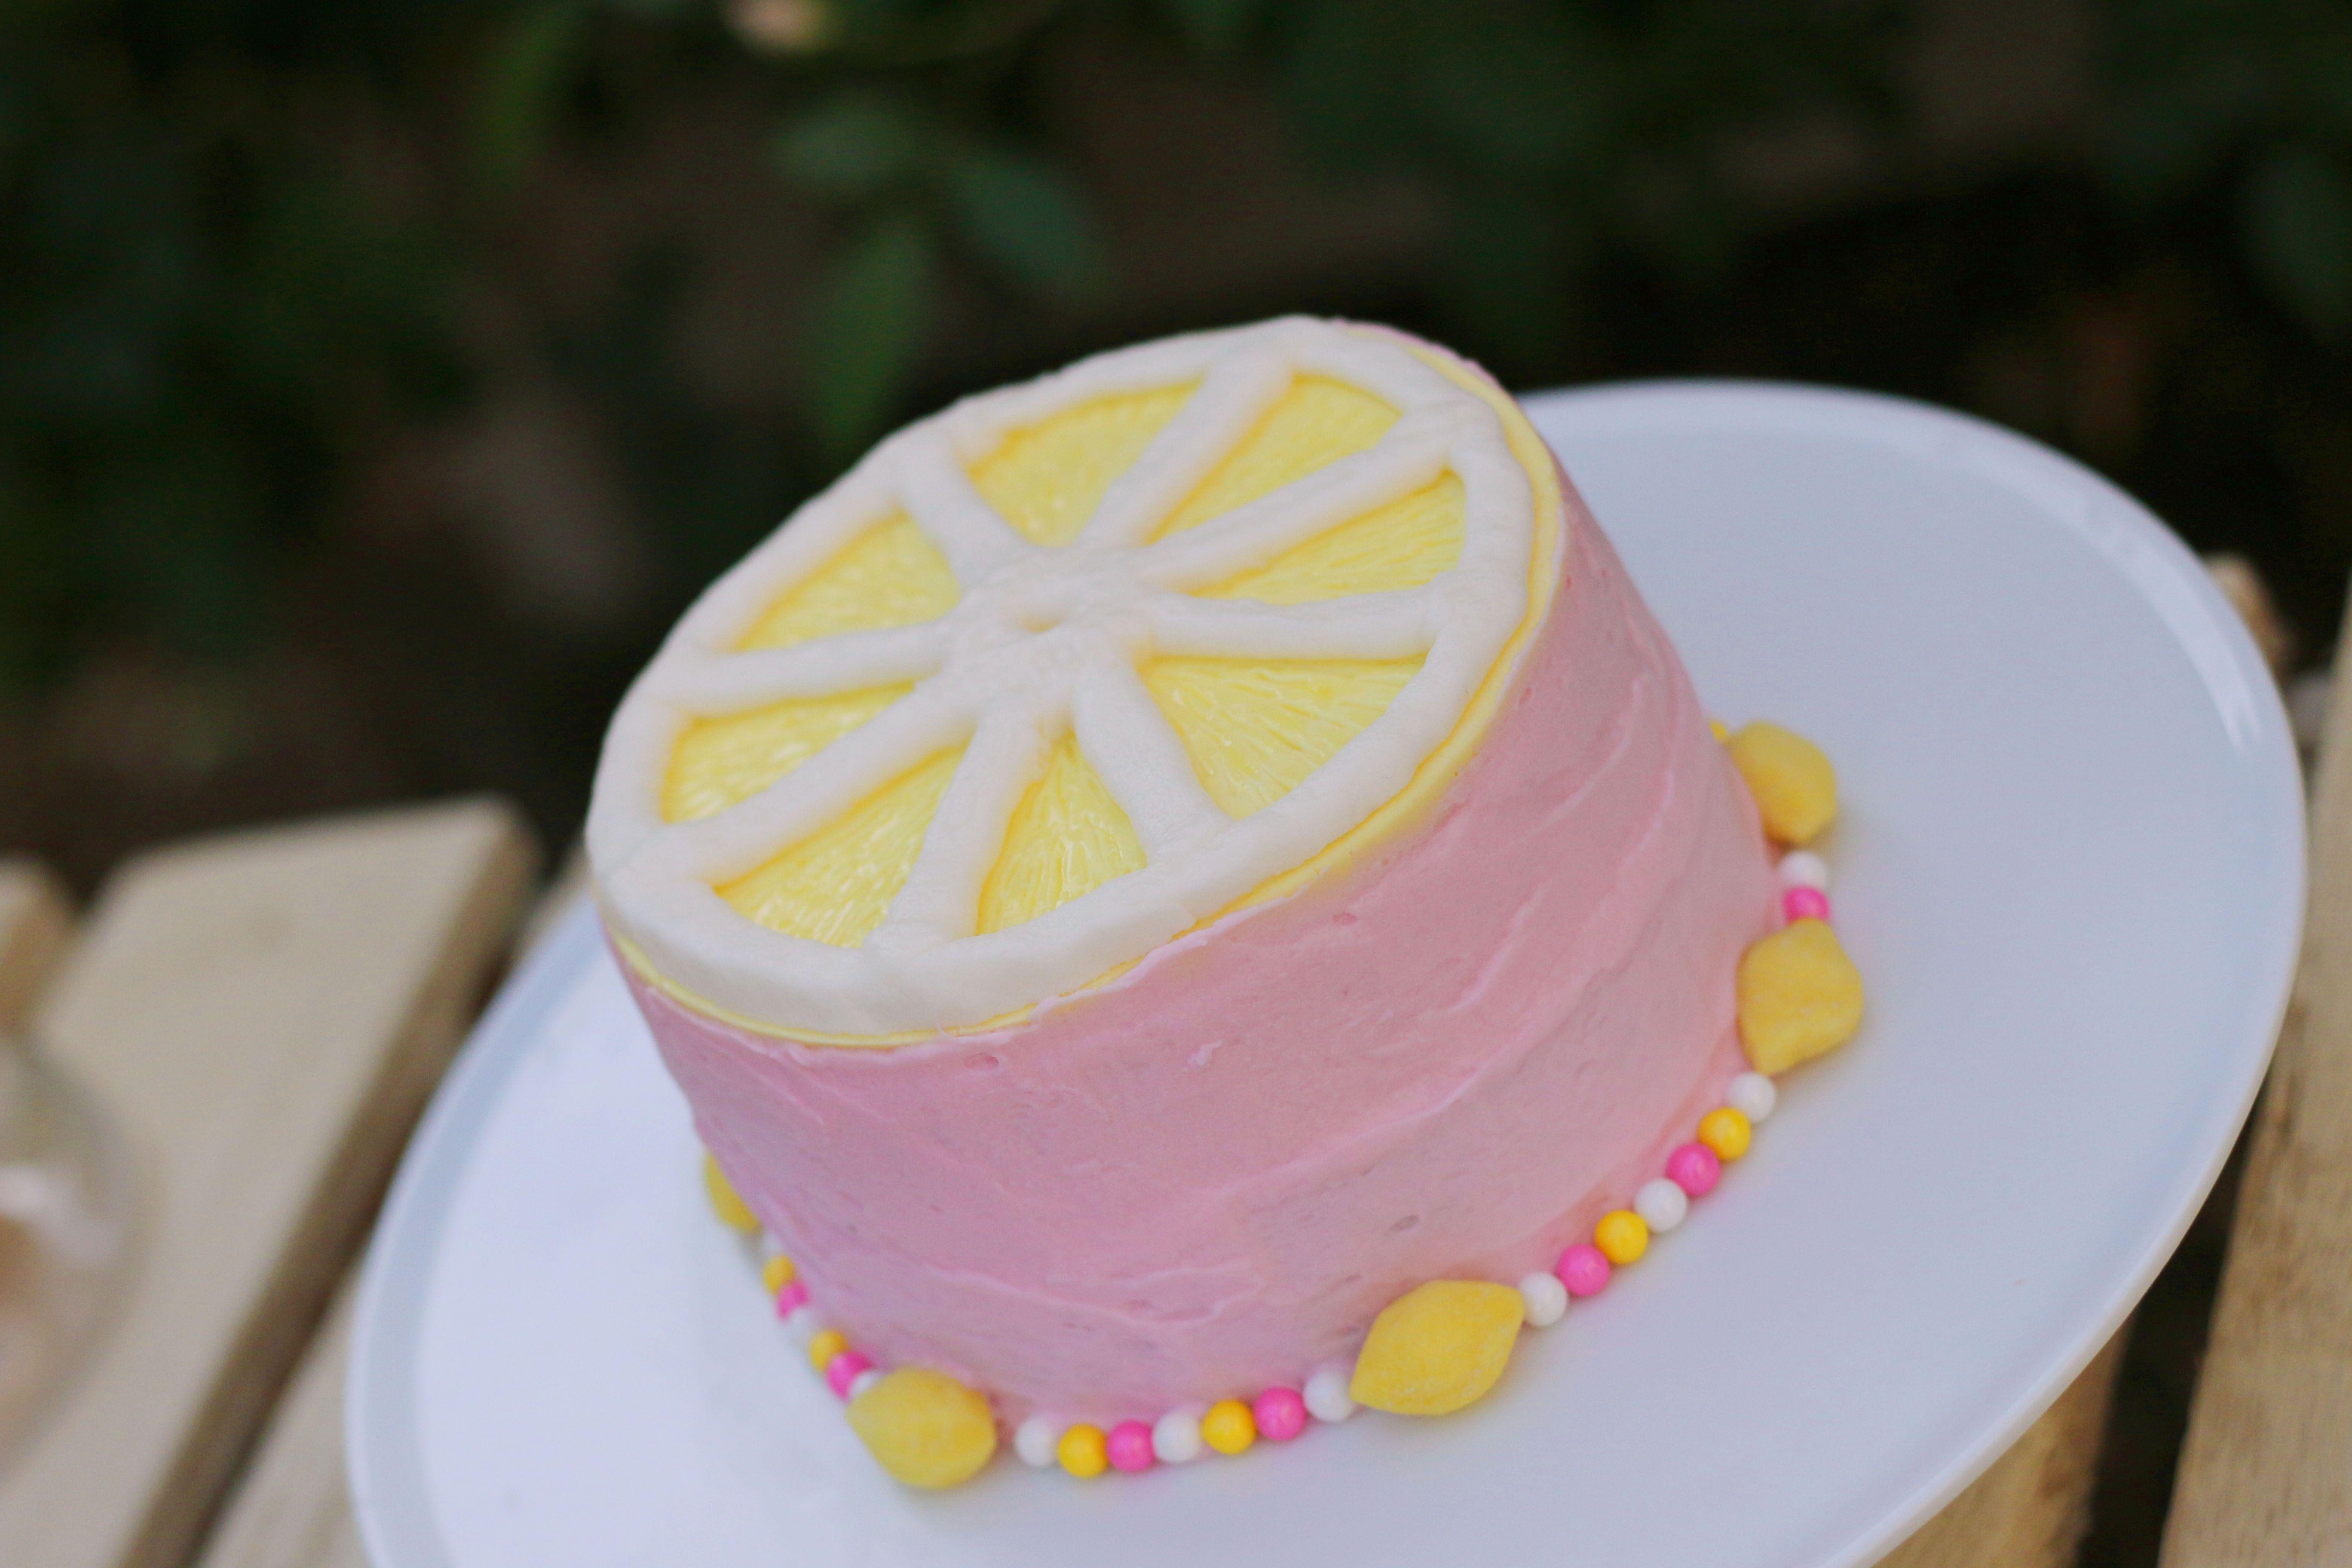 Lemon slice smash cake for pink lemonade first birthday party